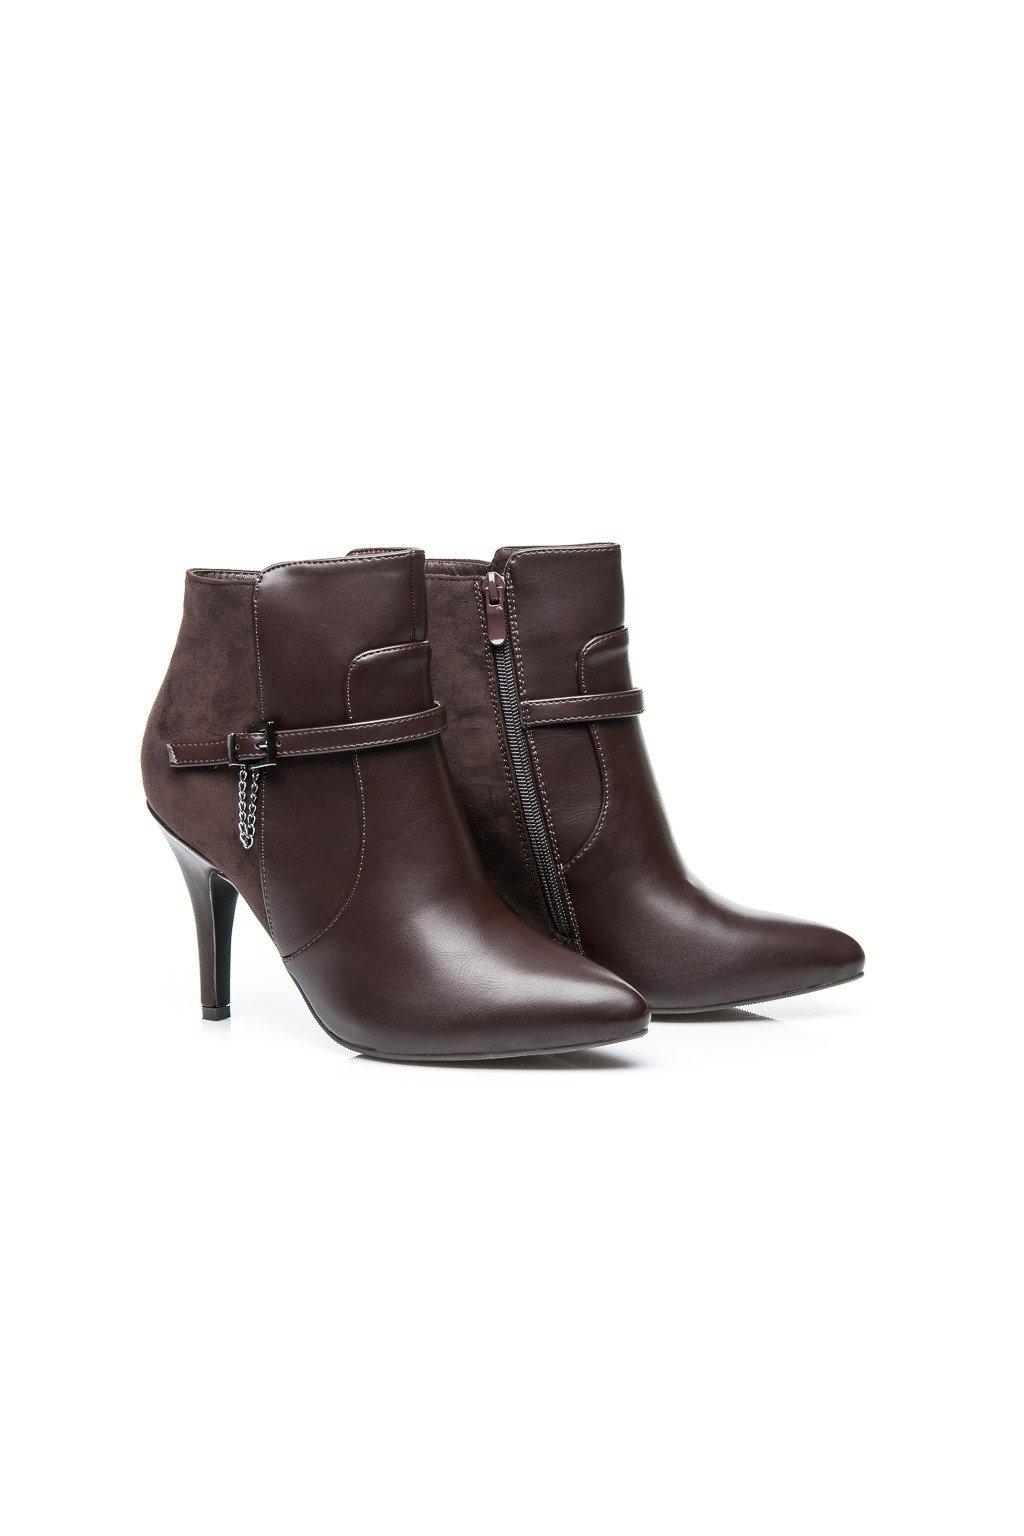 Elegantné topánky s vysokým opätkom  28cdedbef23